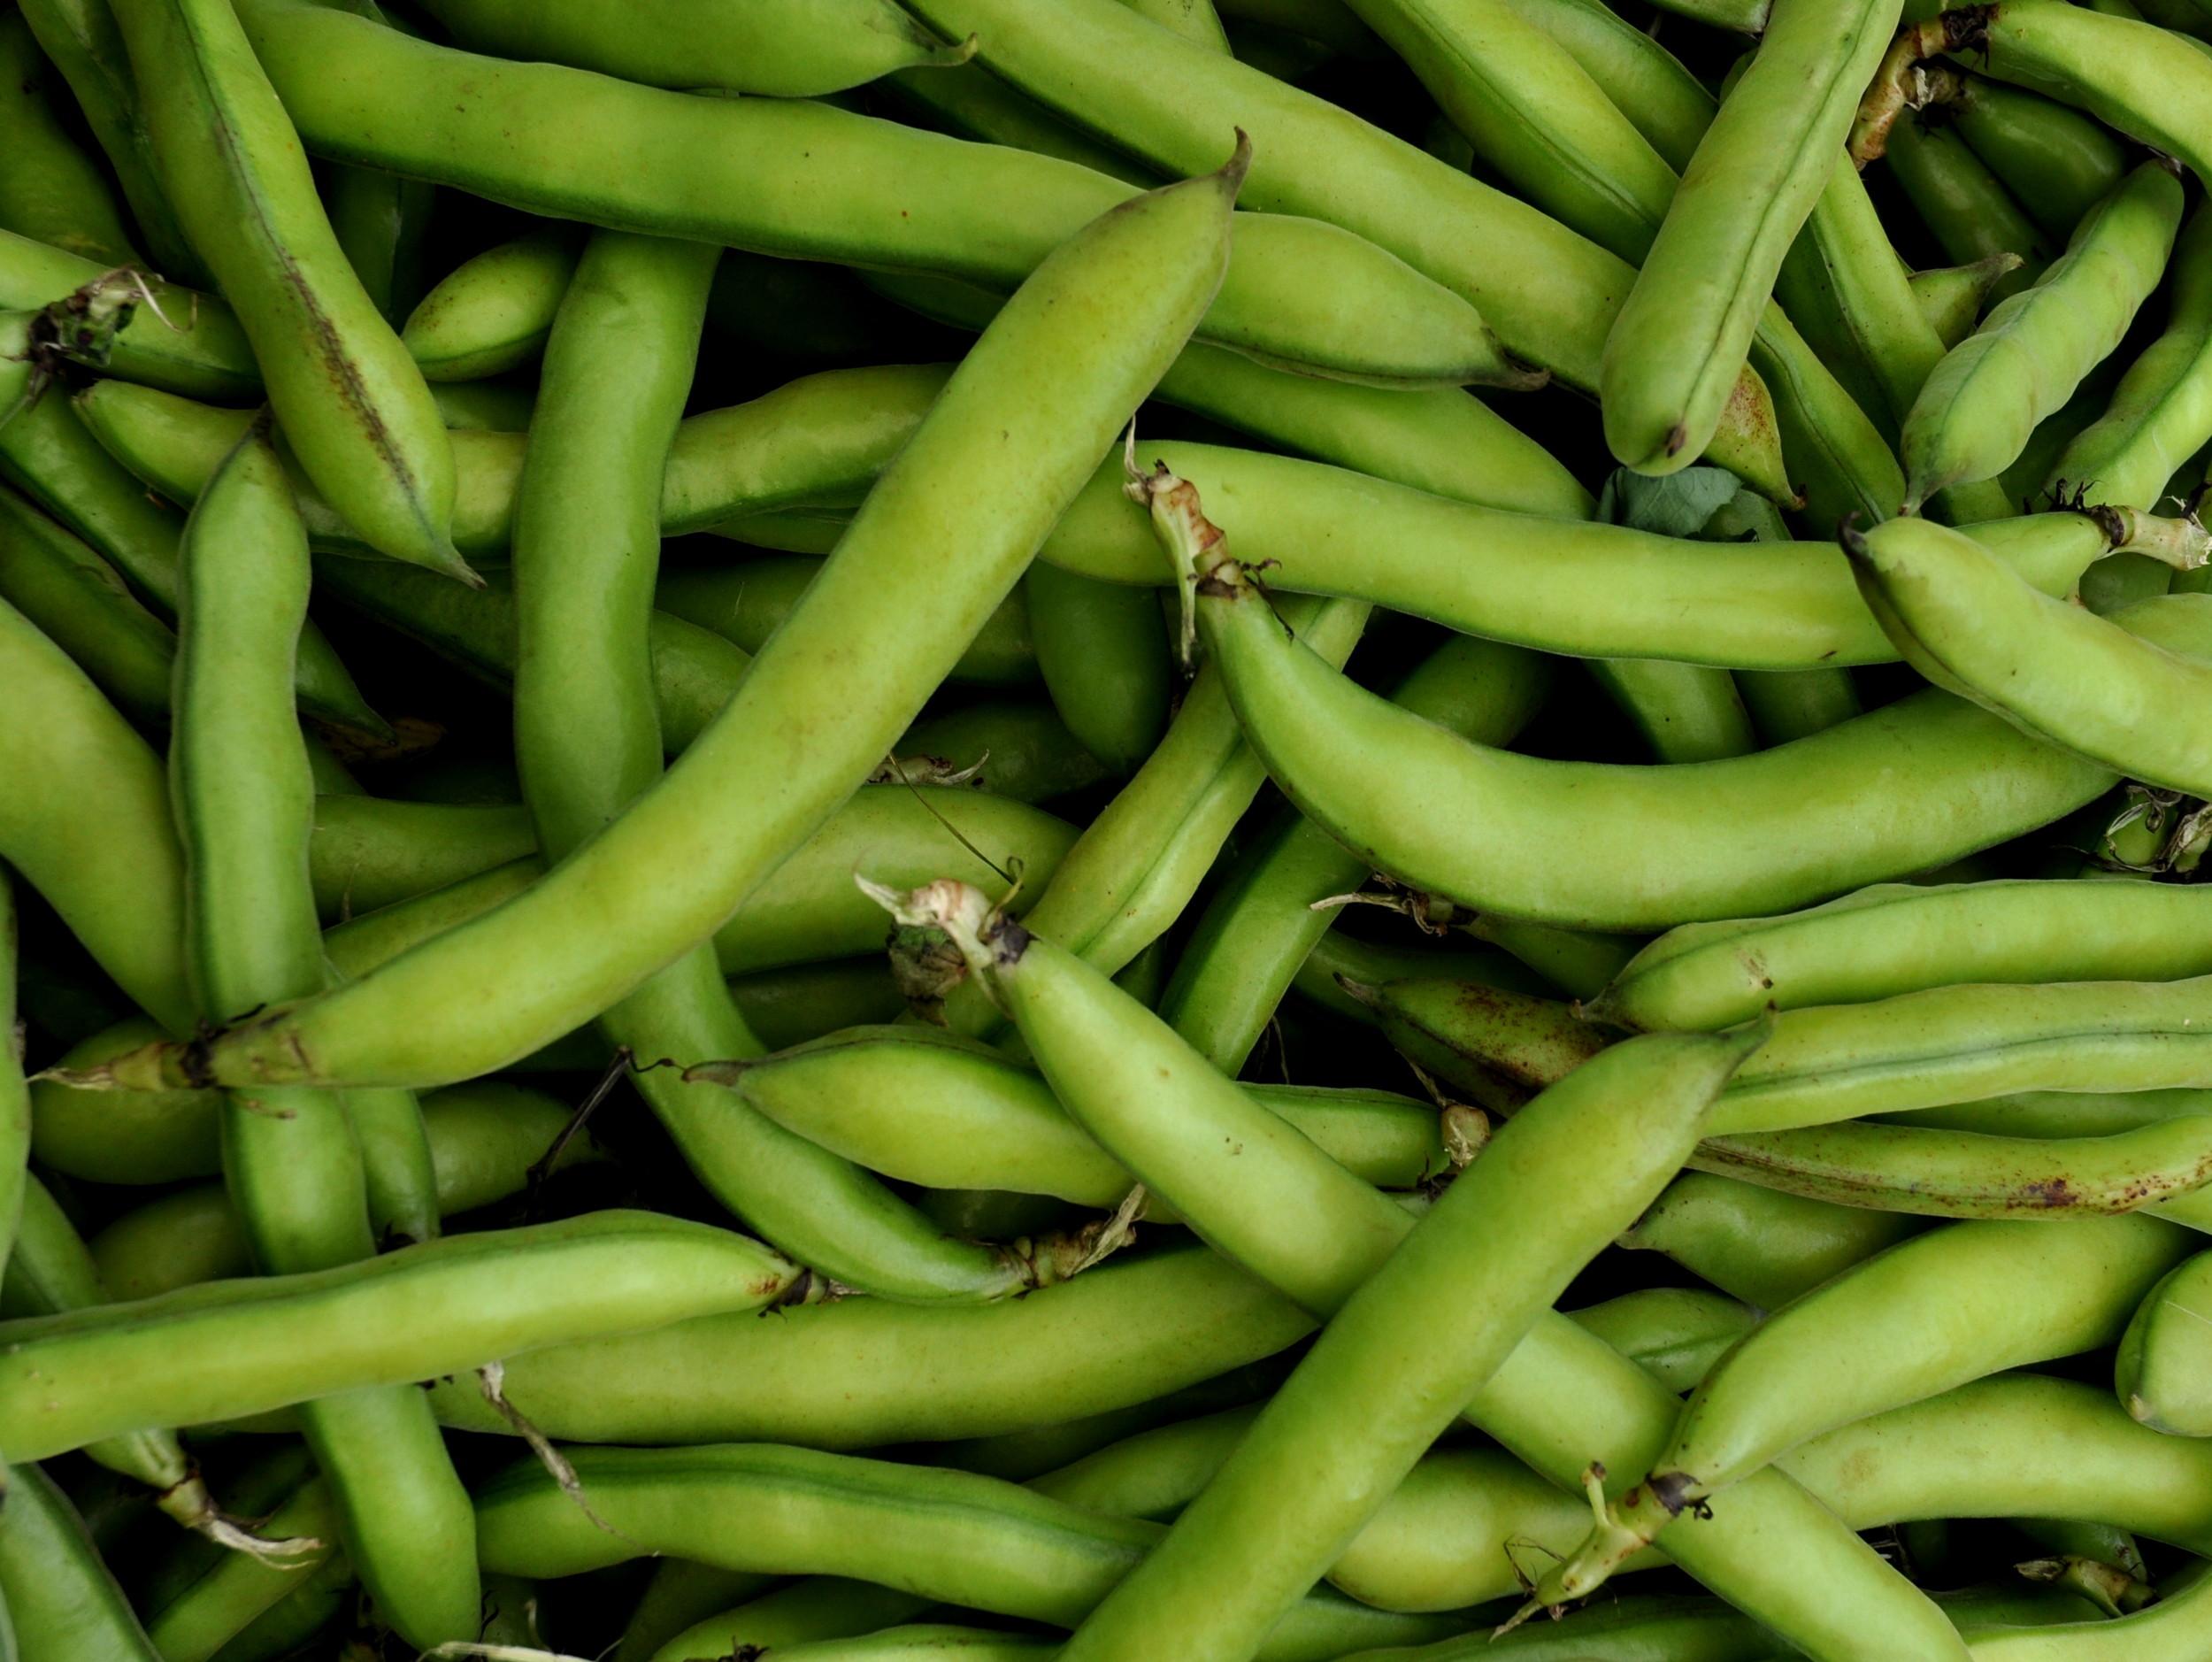 Fava beans from Stoney Plains Organic Farms. Photo copyright 2013 by Zachary D. Lyons.